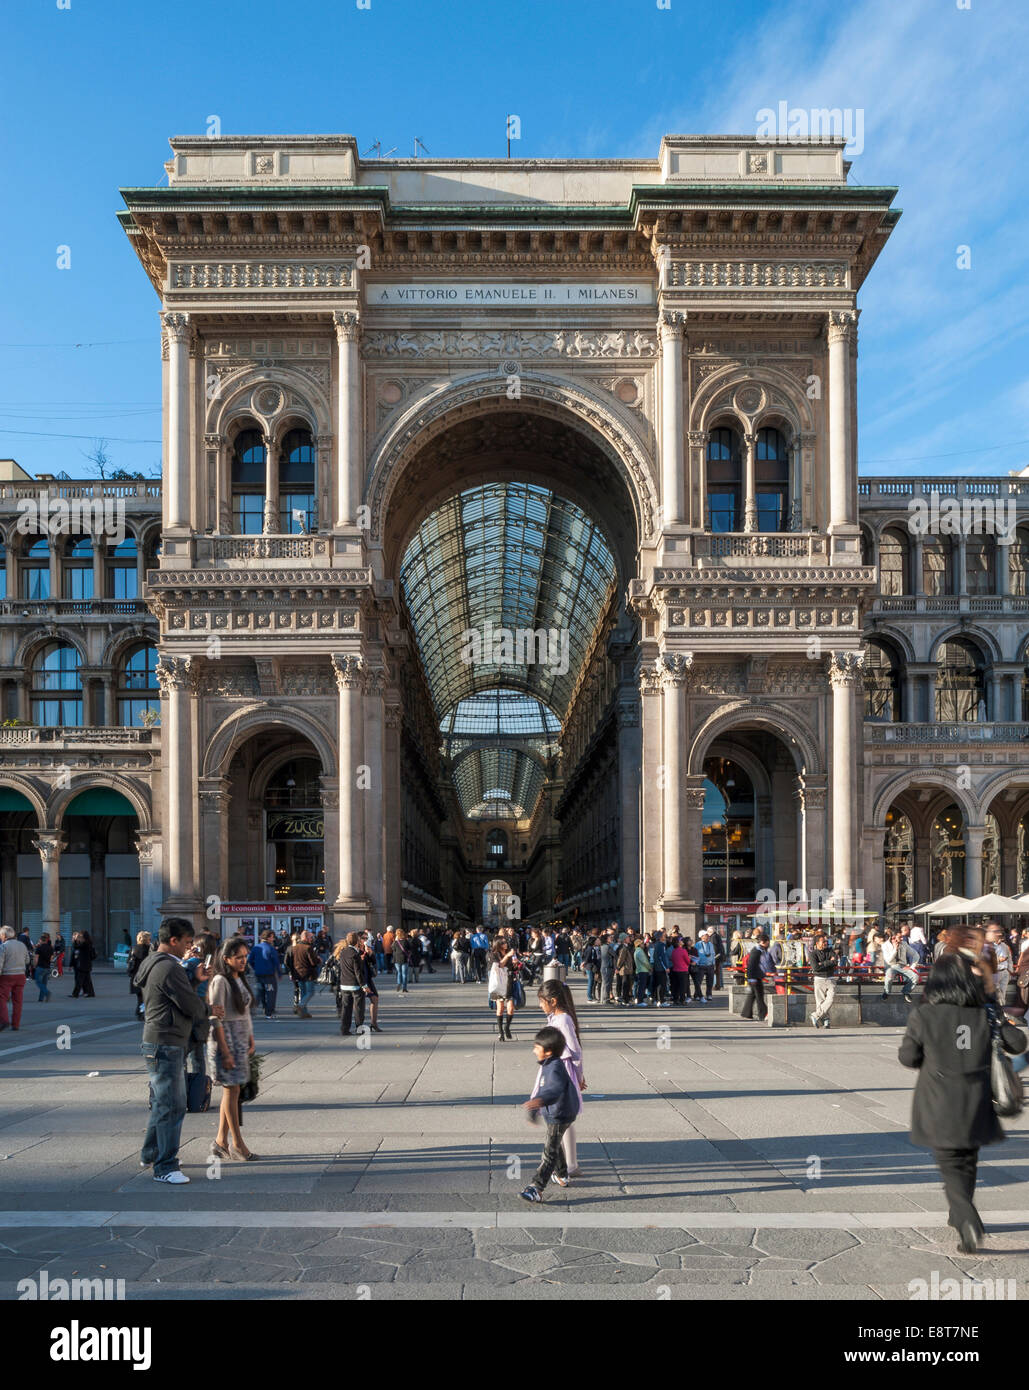 Piazza del Duomo with Galleria Vittorio Emanuele II shopping arcade, Milan, Lombardy, Italy - Stock Image